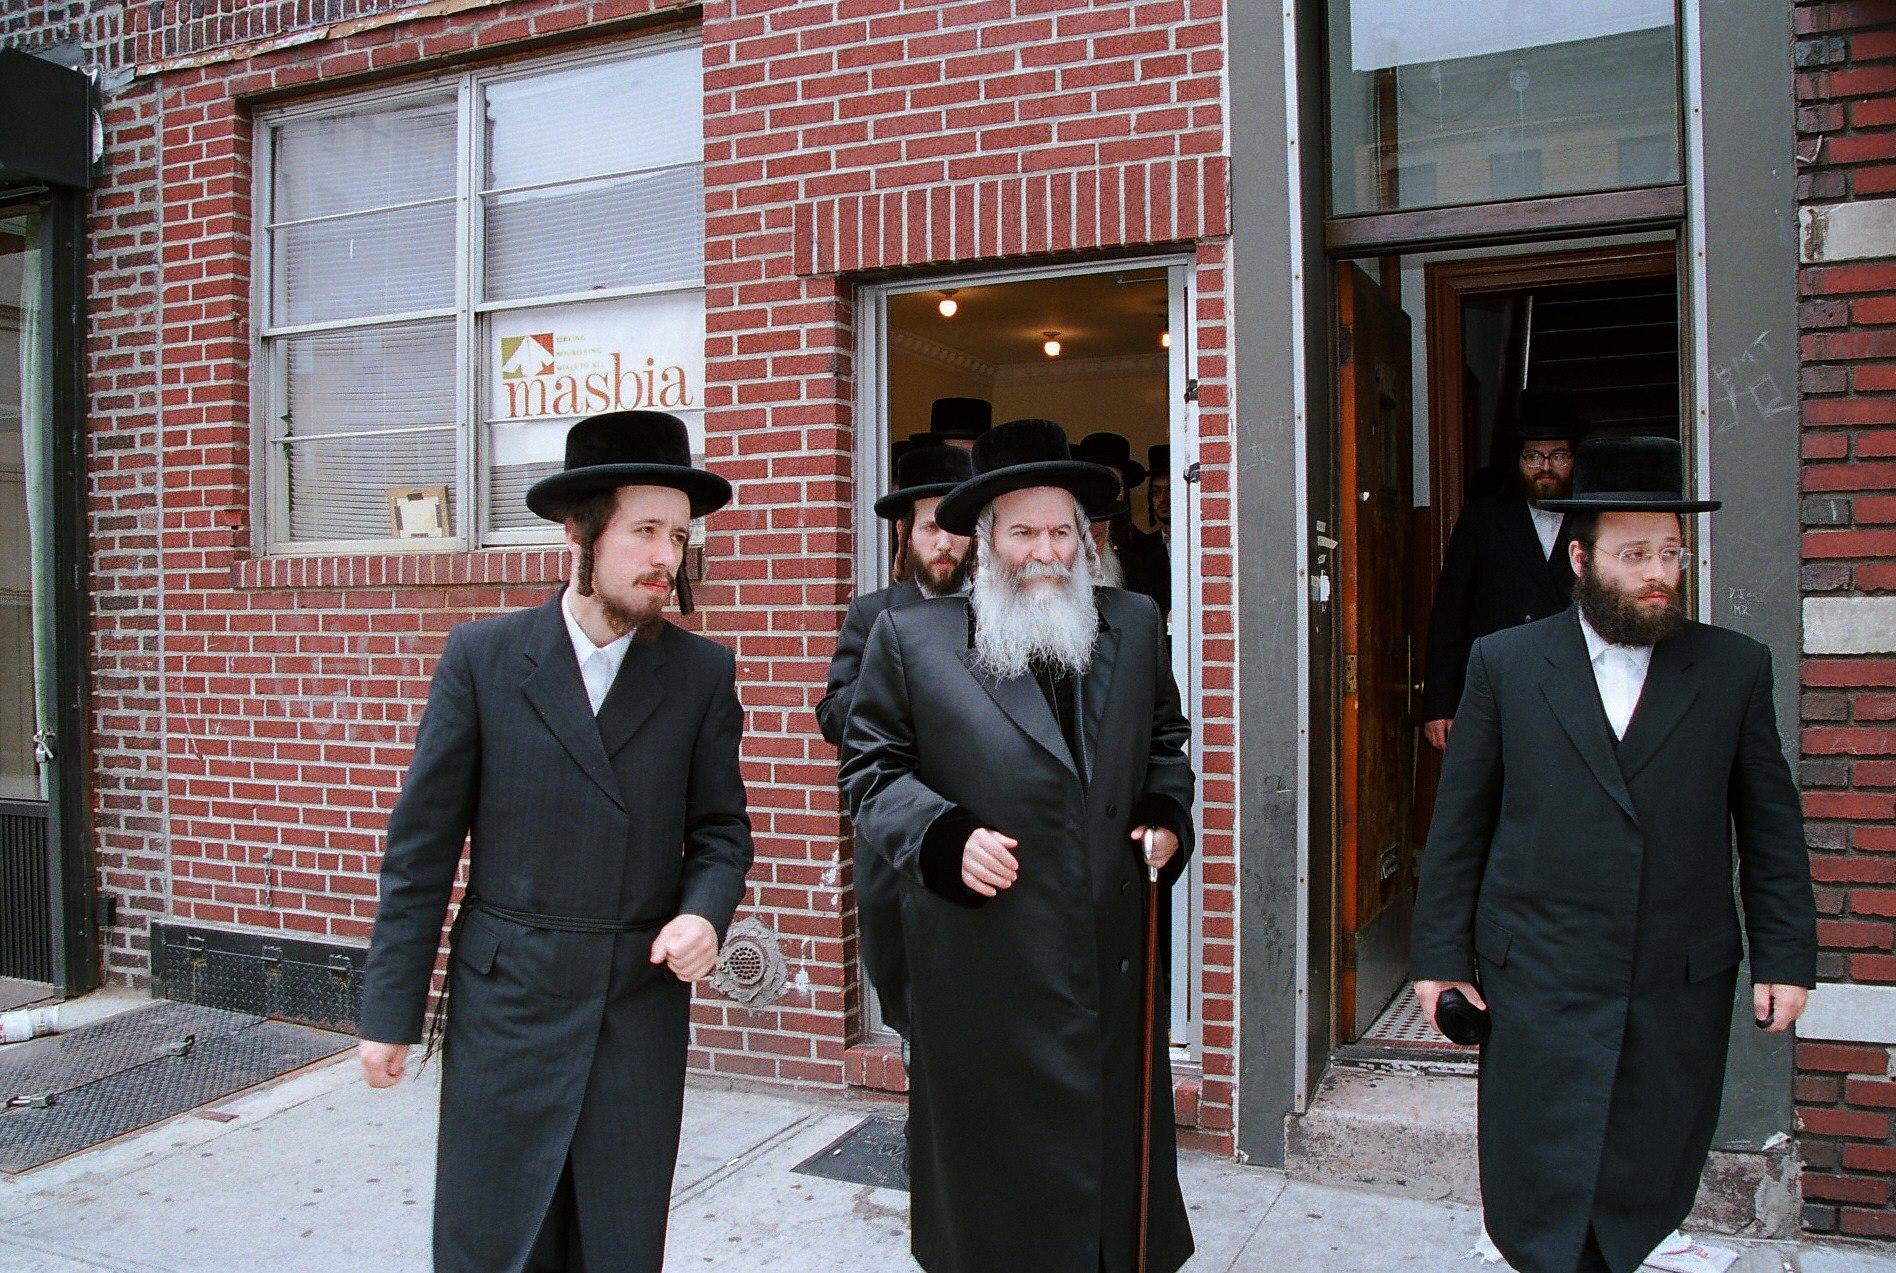 Masbia_Supporter__Bobover_Rebbe__Rabbi_Ben_Zion_Halberstam__Affixing_a_Mezuzah_at_Masbia_of_Boro_Park.jpg